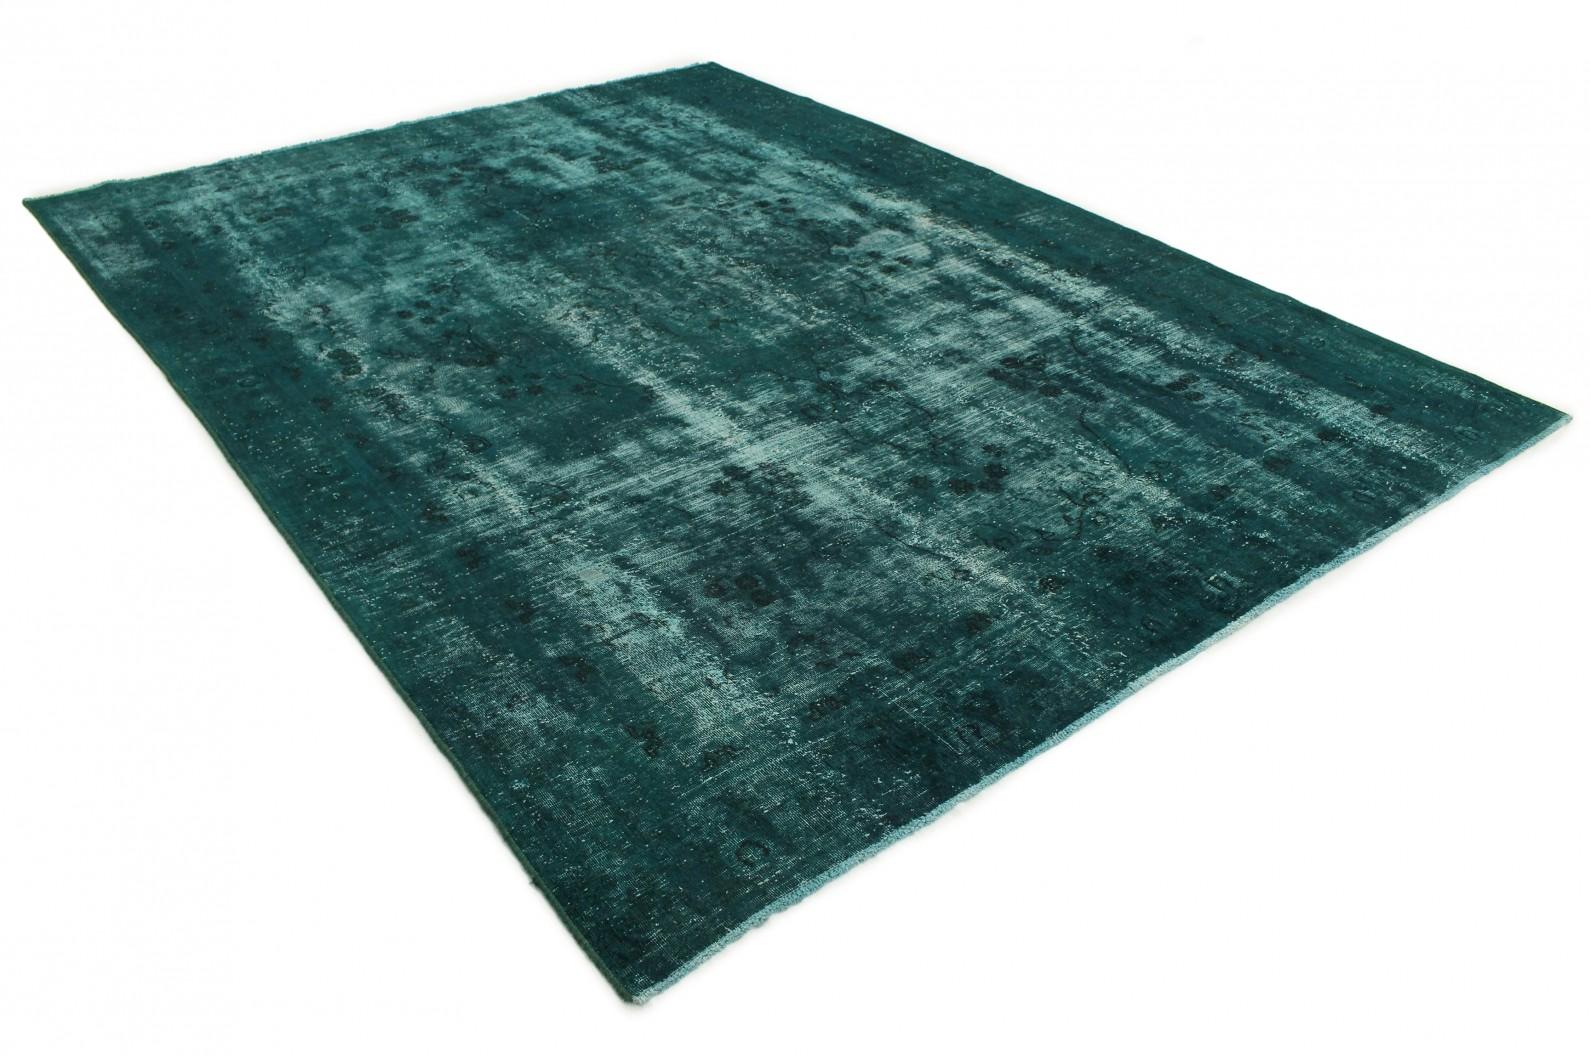 vintage teppich gr n t rkis in 370x270cm 1001 3254 bei kaufen. Black Bedroom Furniture Sets. Home Design Ideas